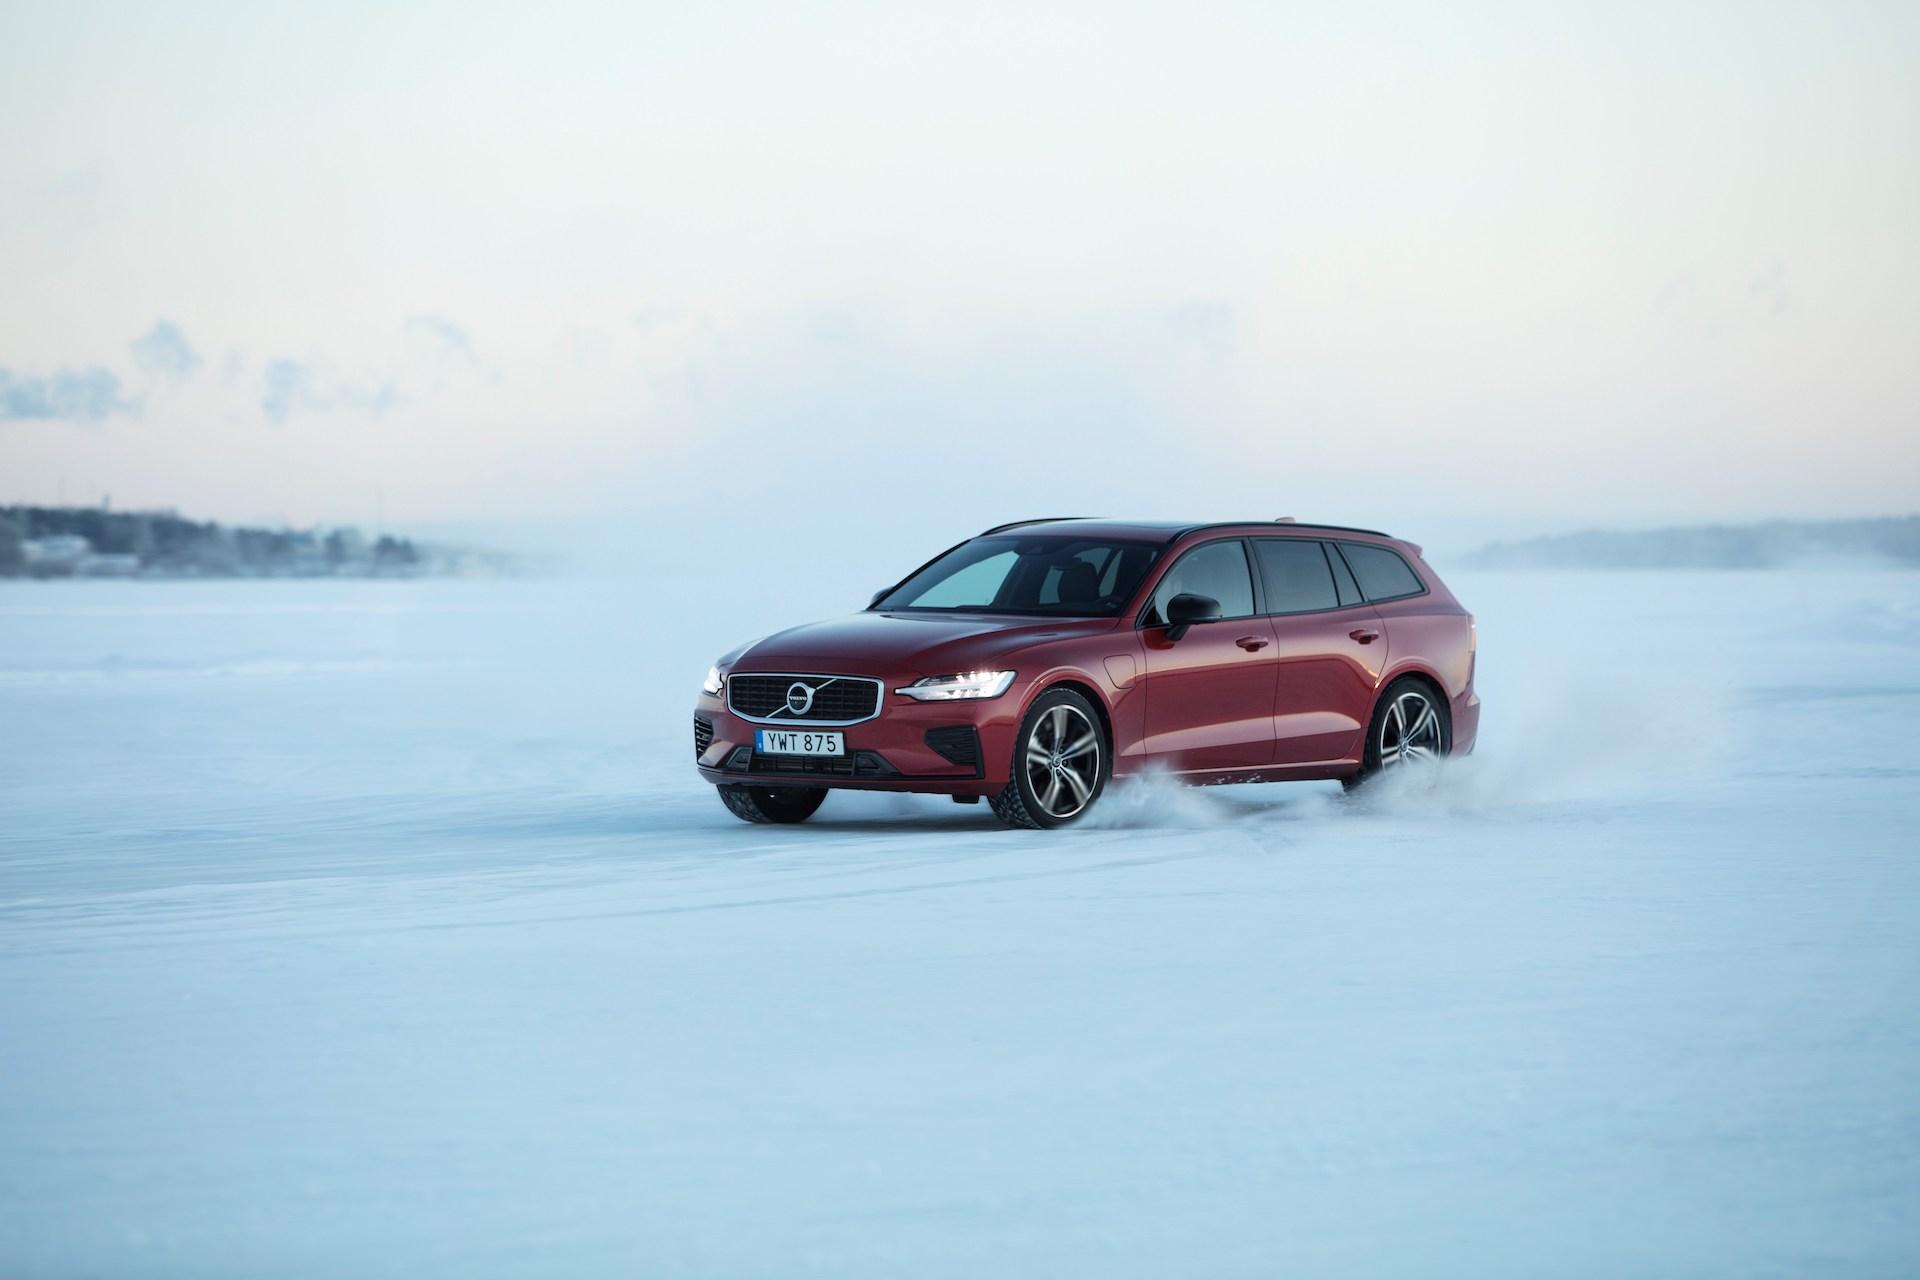 Volvo V60 T8 Test Drive in Luleå, Sweden